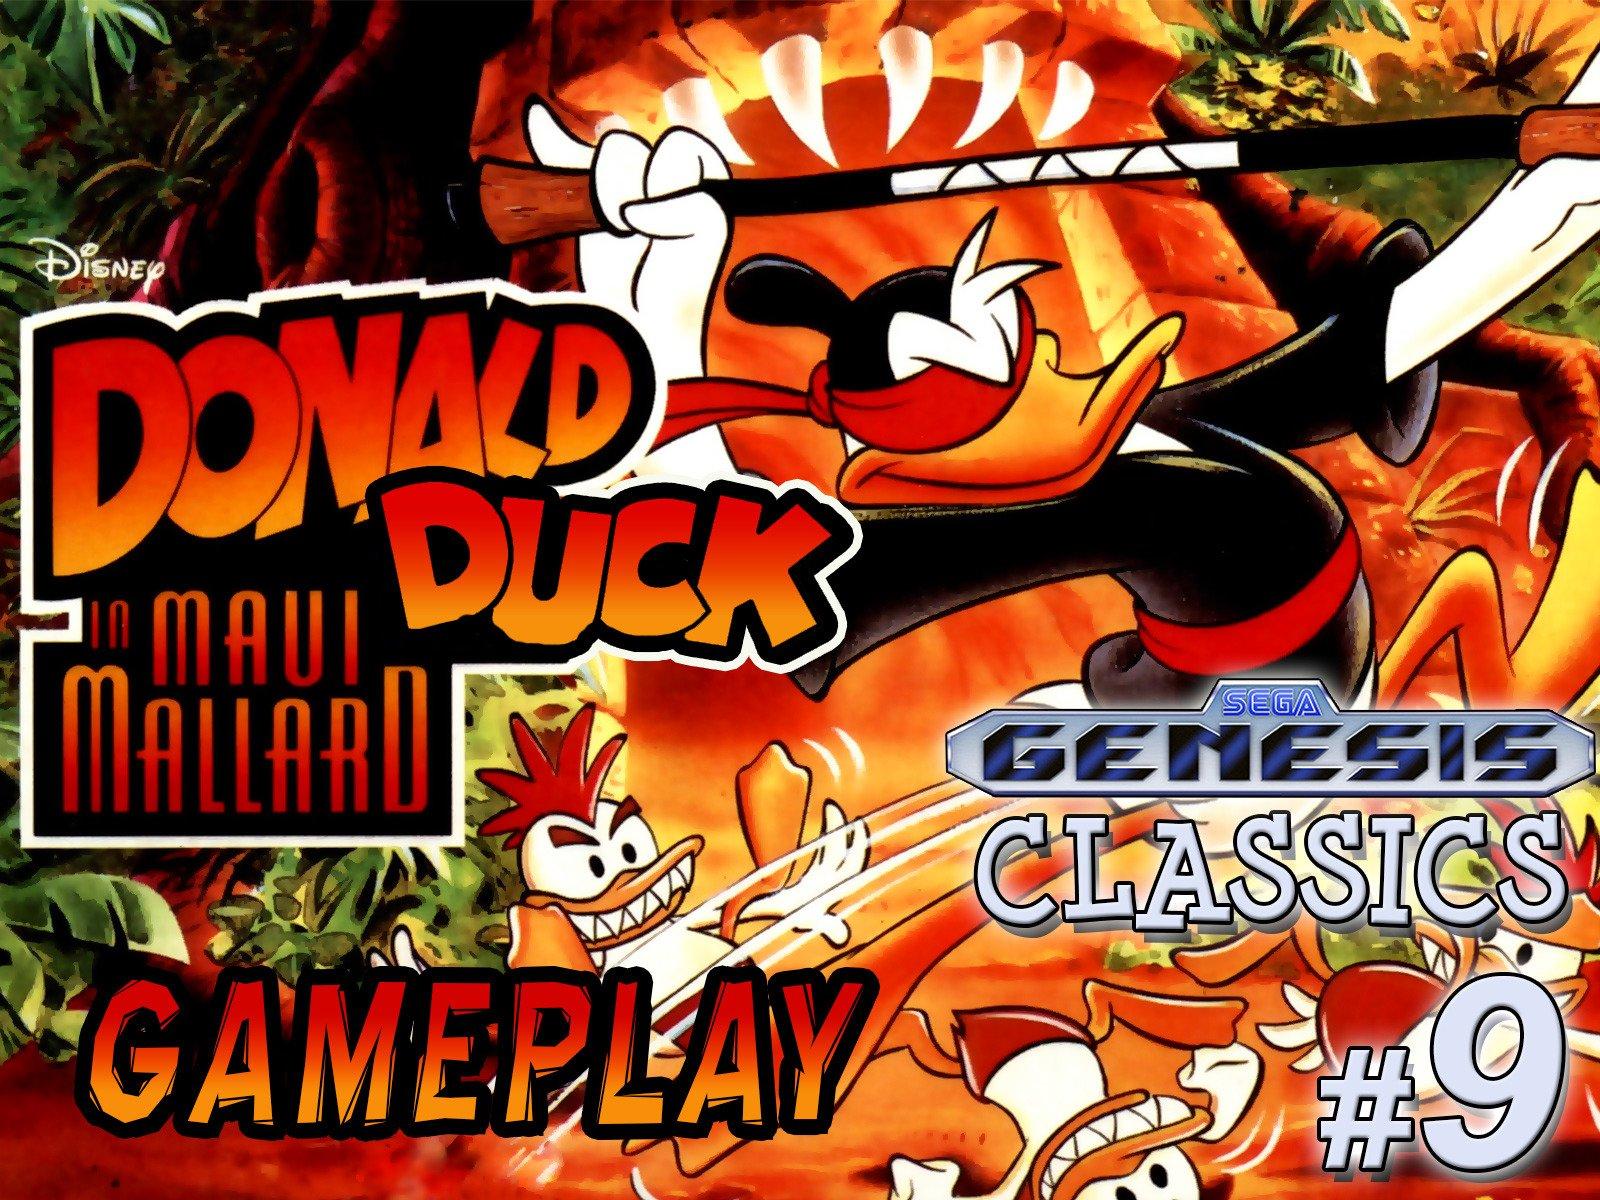 Clip: Donald Duck in Maui Mallard Gameplay (Genesis Classics 9) - Season 1